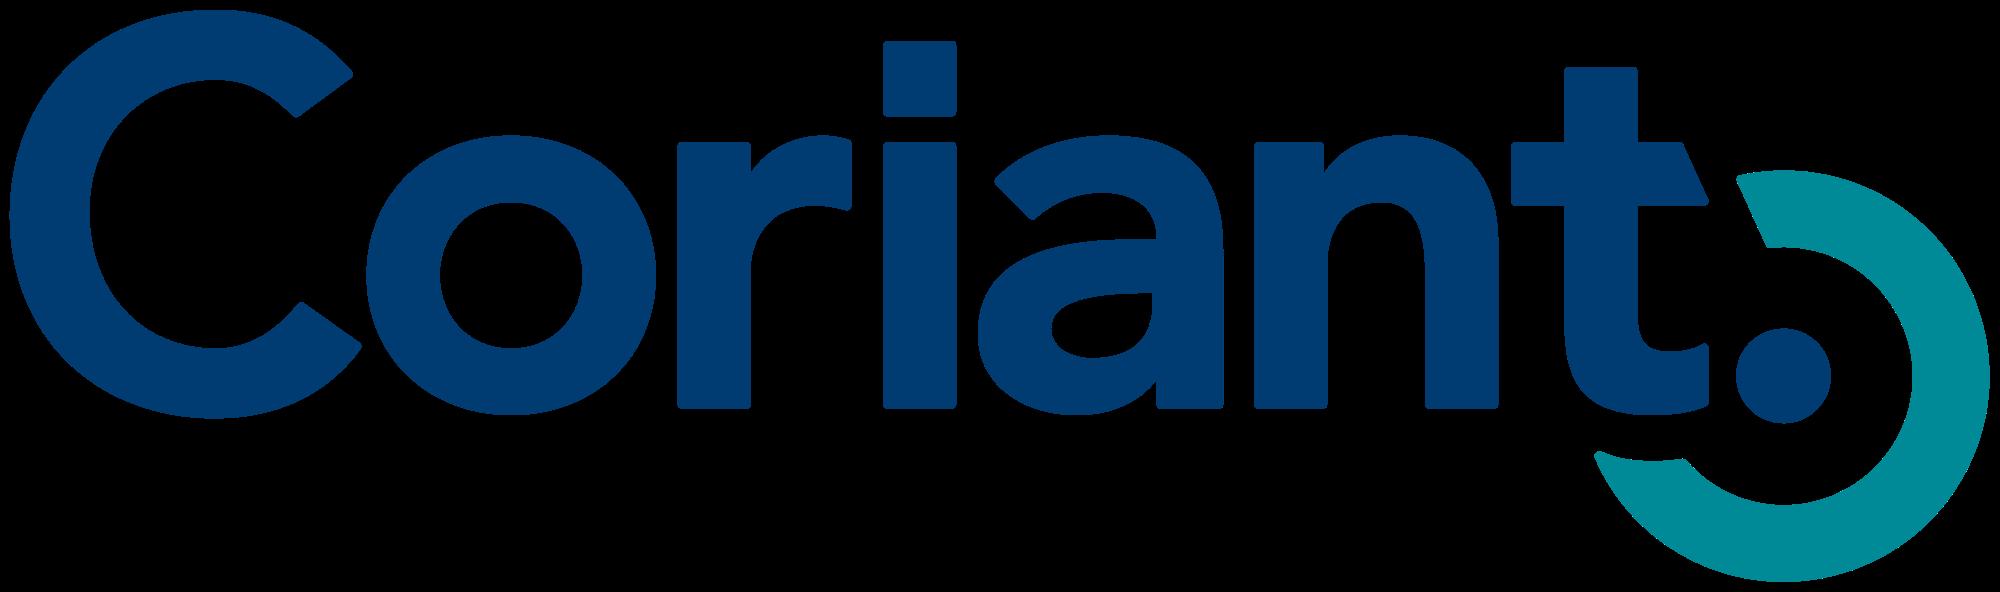 coriant partner logo